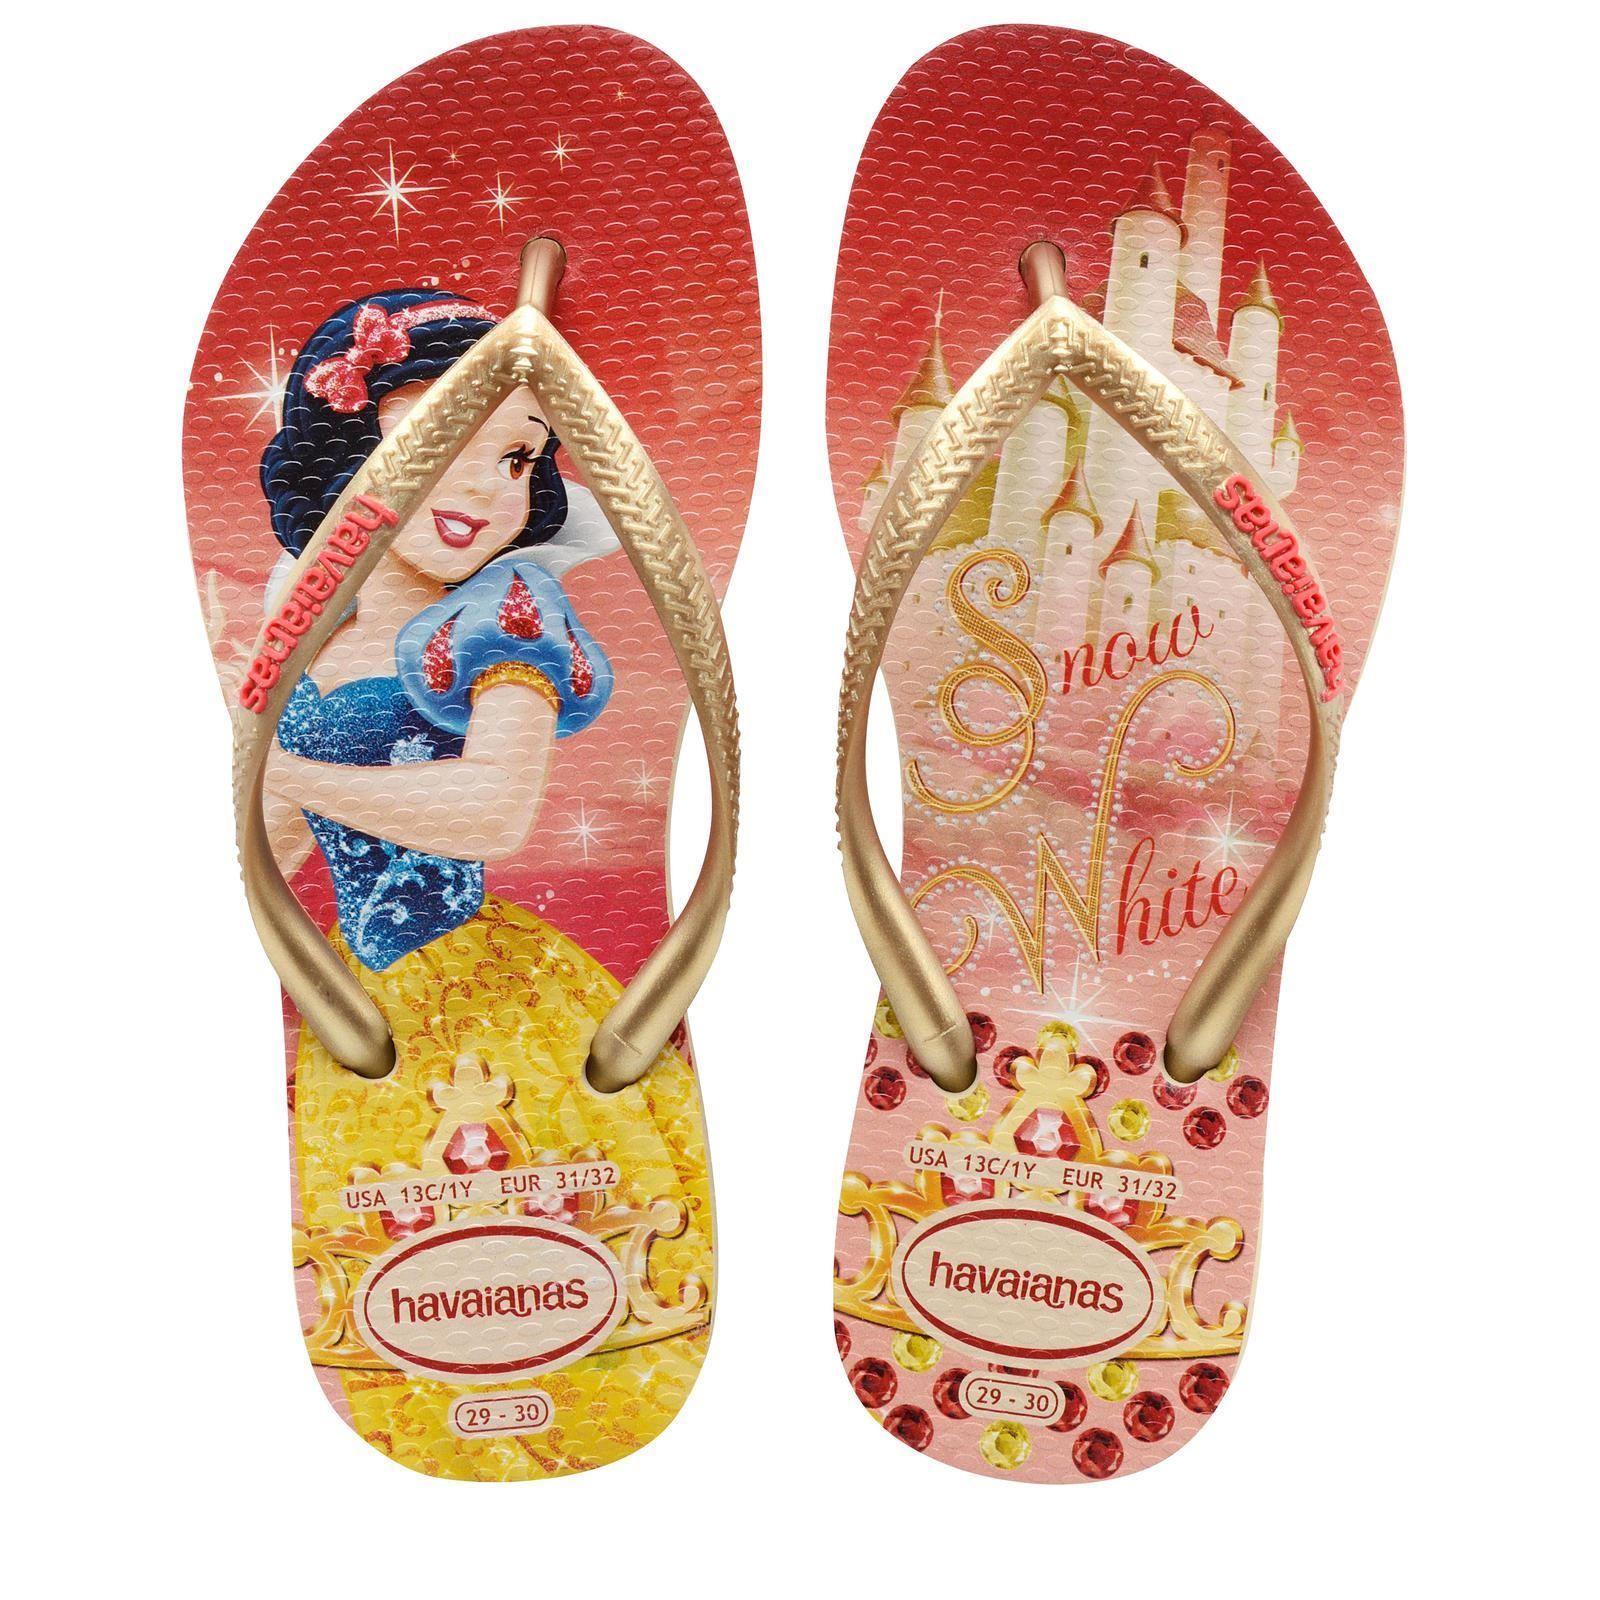 havaianas brazil snow white original flip flops all kids girls sizes ebay. Black Bedroom Furniture Sets. Home Design Ideas